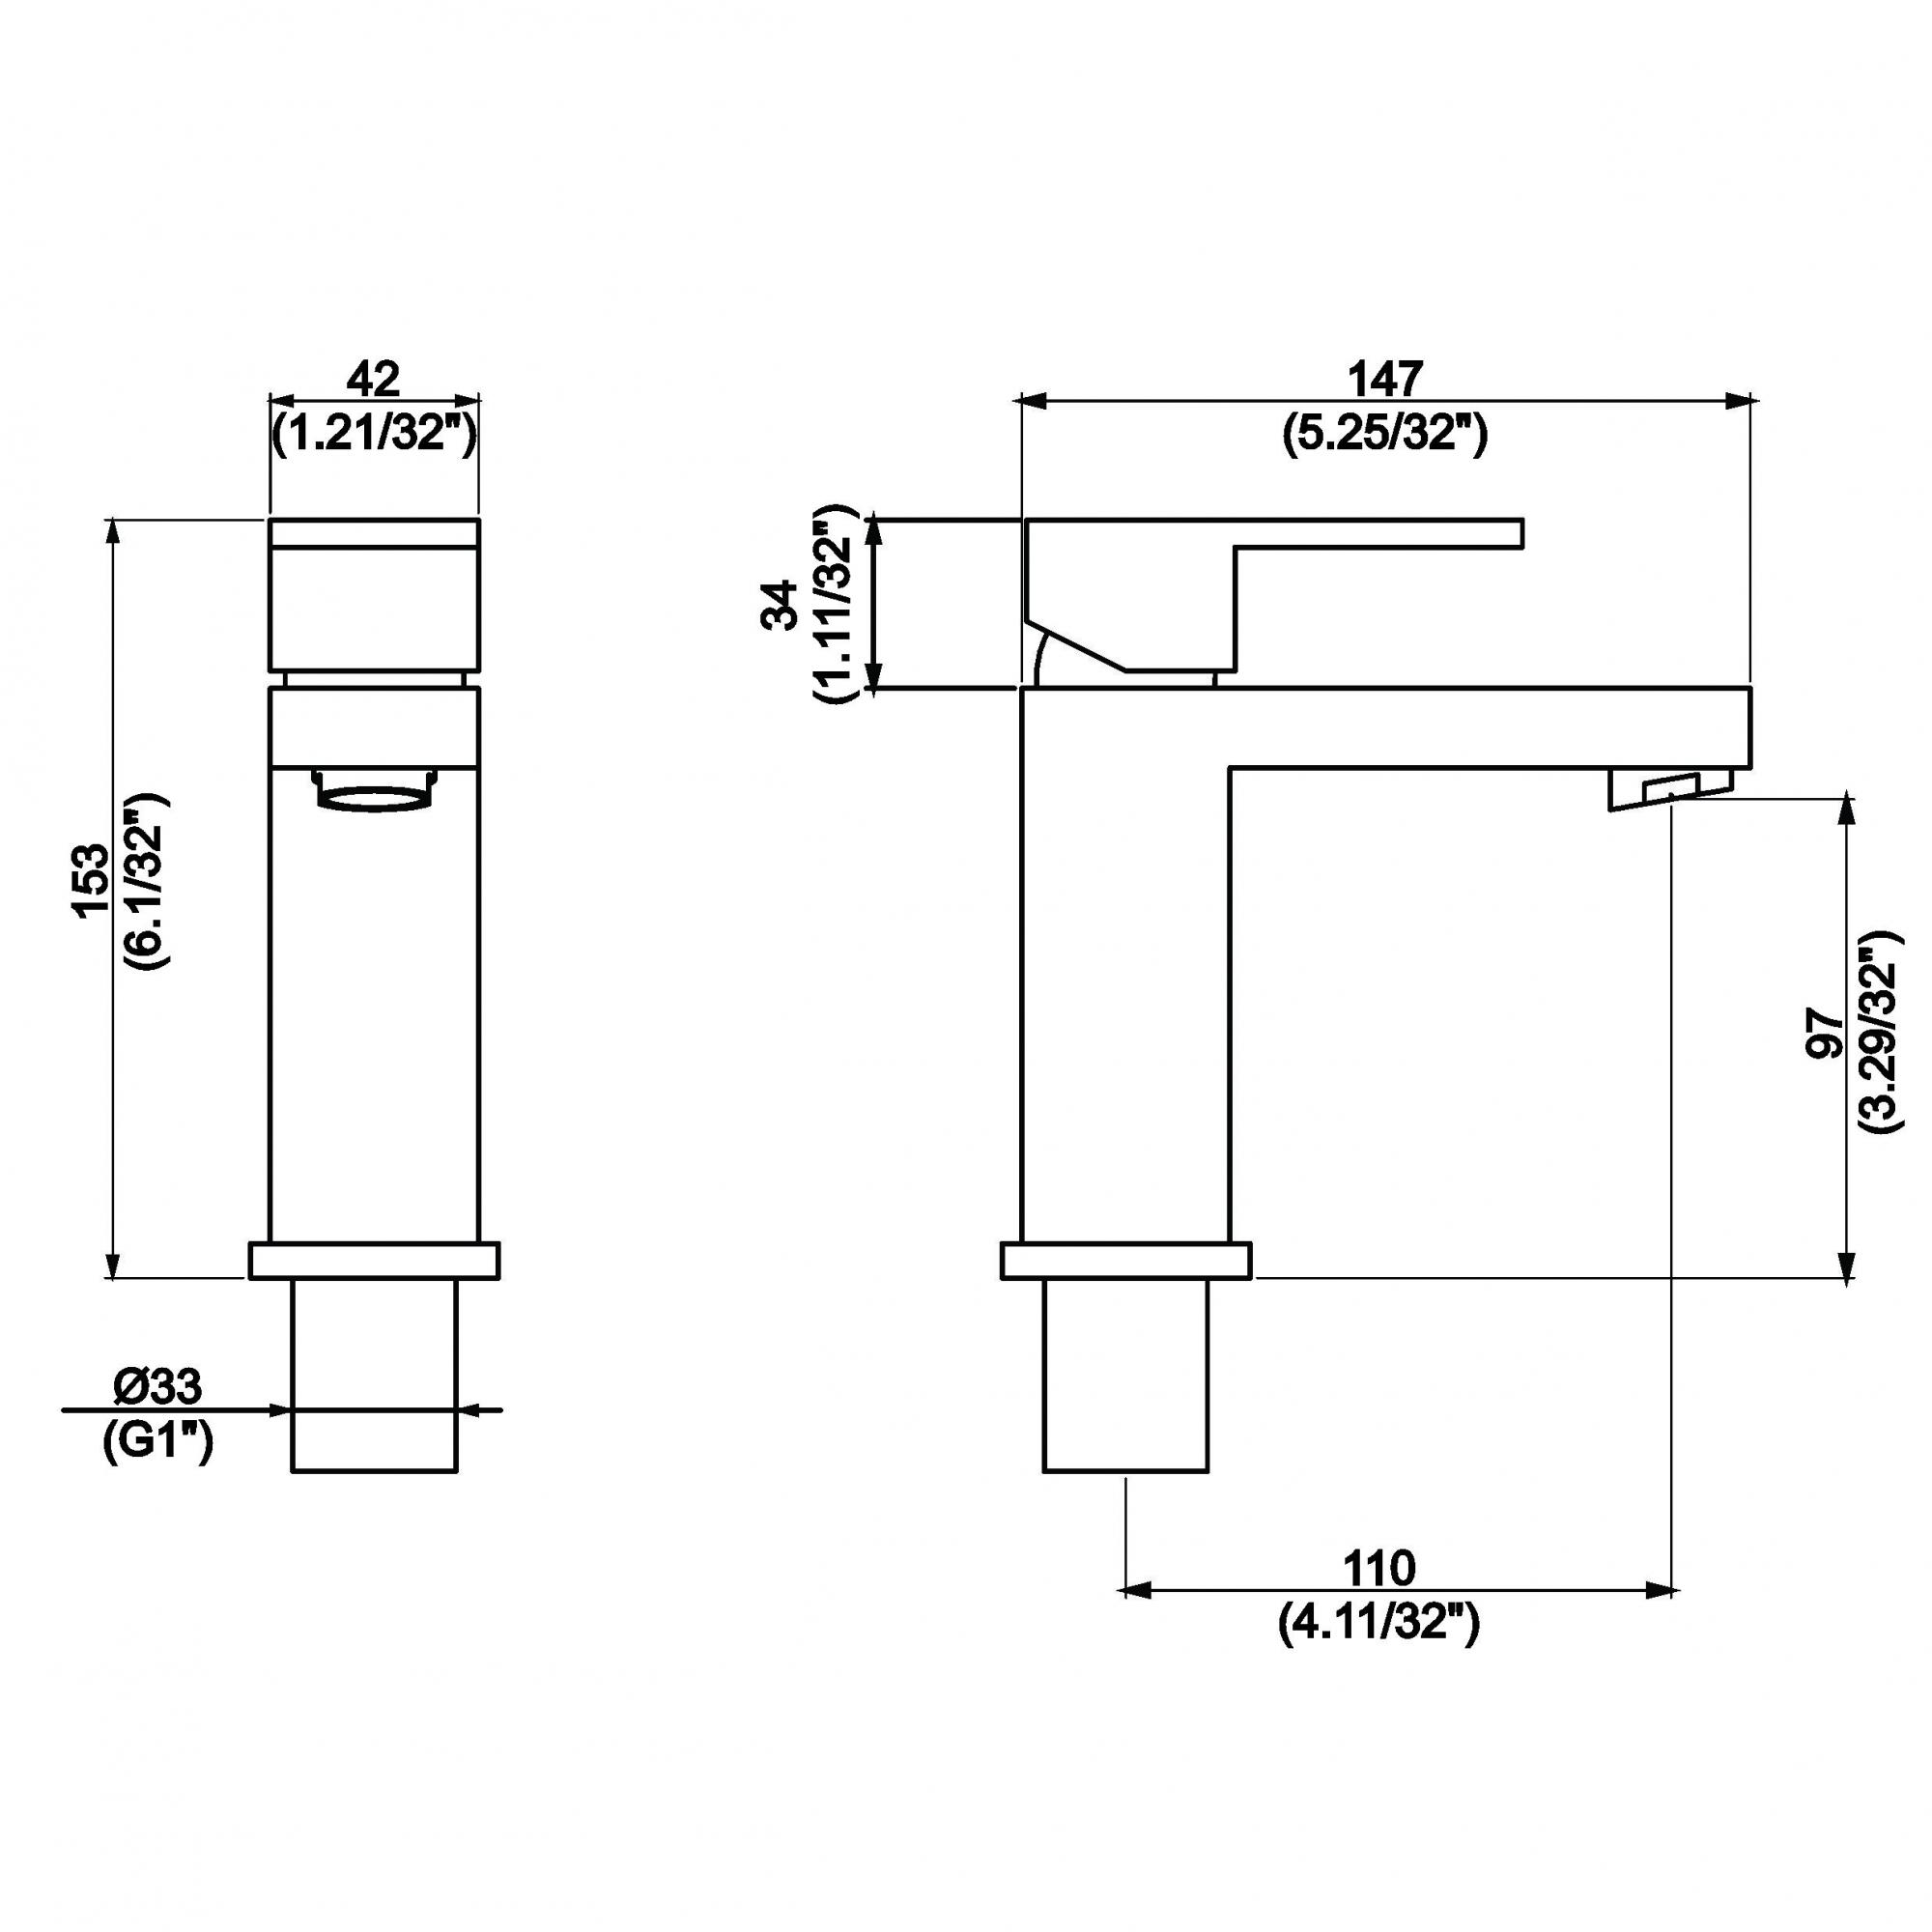 Misturador Monocomando para Lavatório Flaunt Dn15 2875 C-91